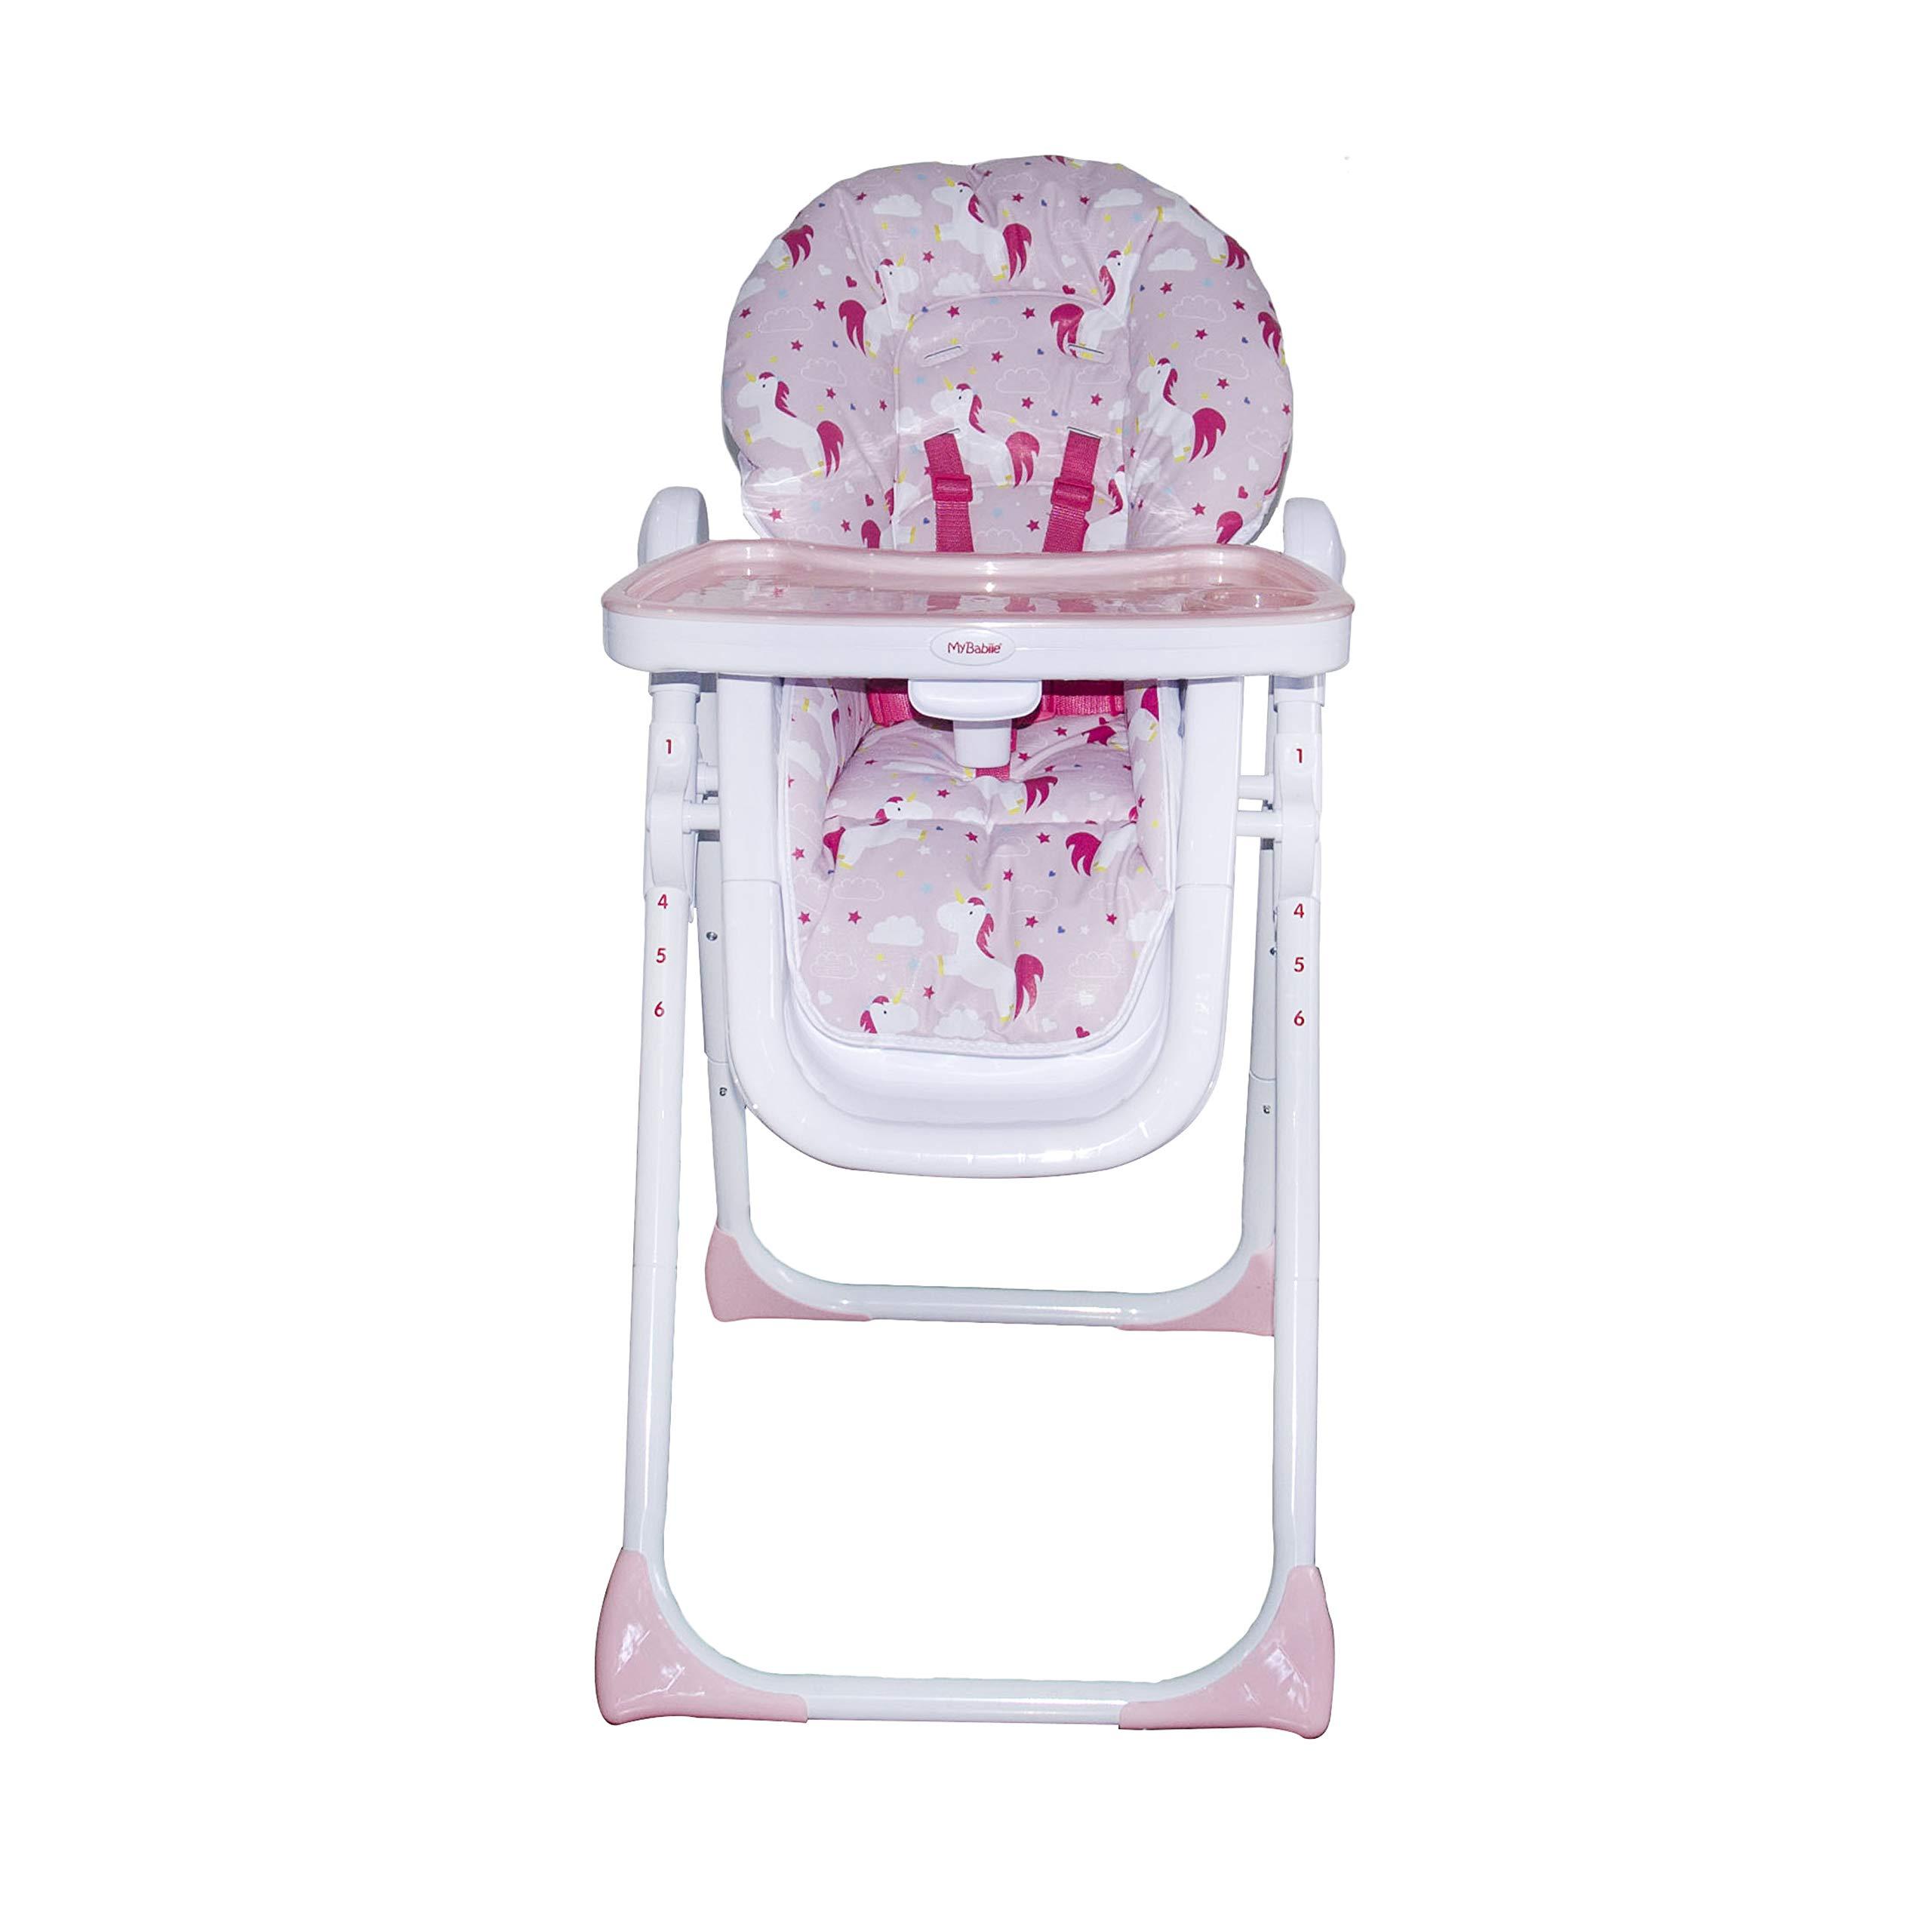 Believe by Katie Piper Unicorns Premium High Chair